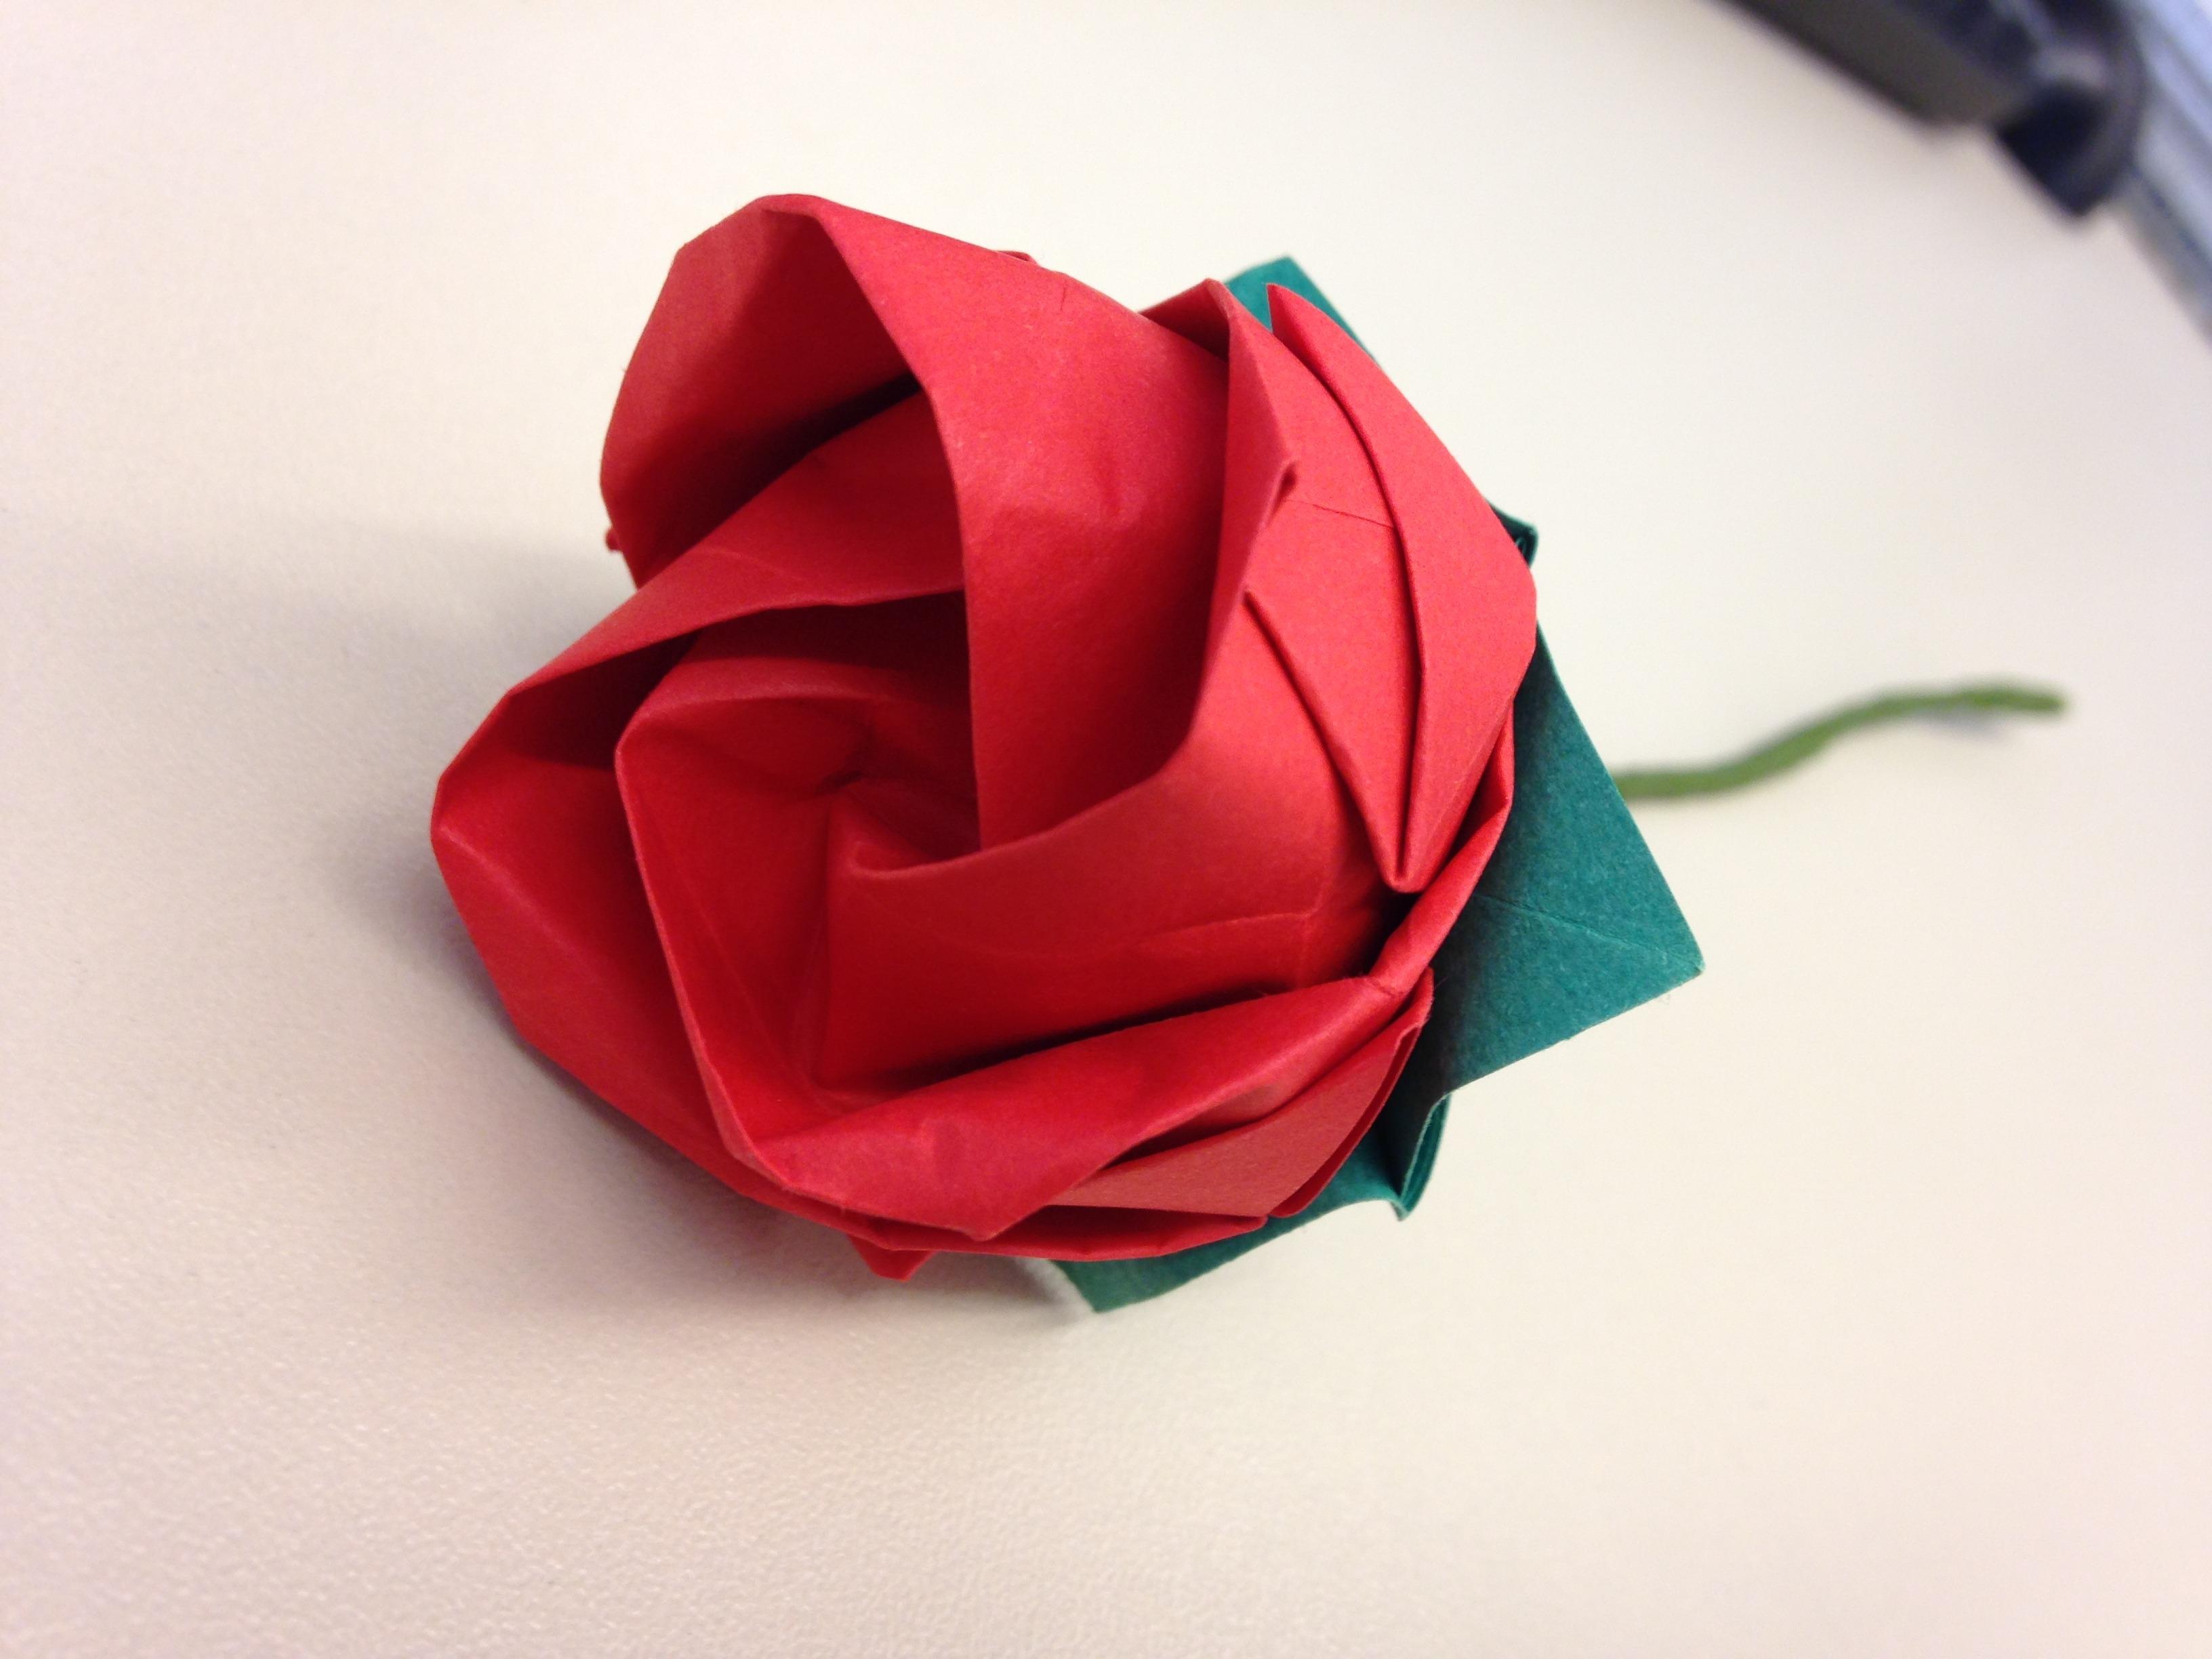 rosa de origami | Tutorial Origami Handmade - photo#32